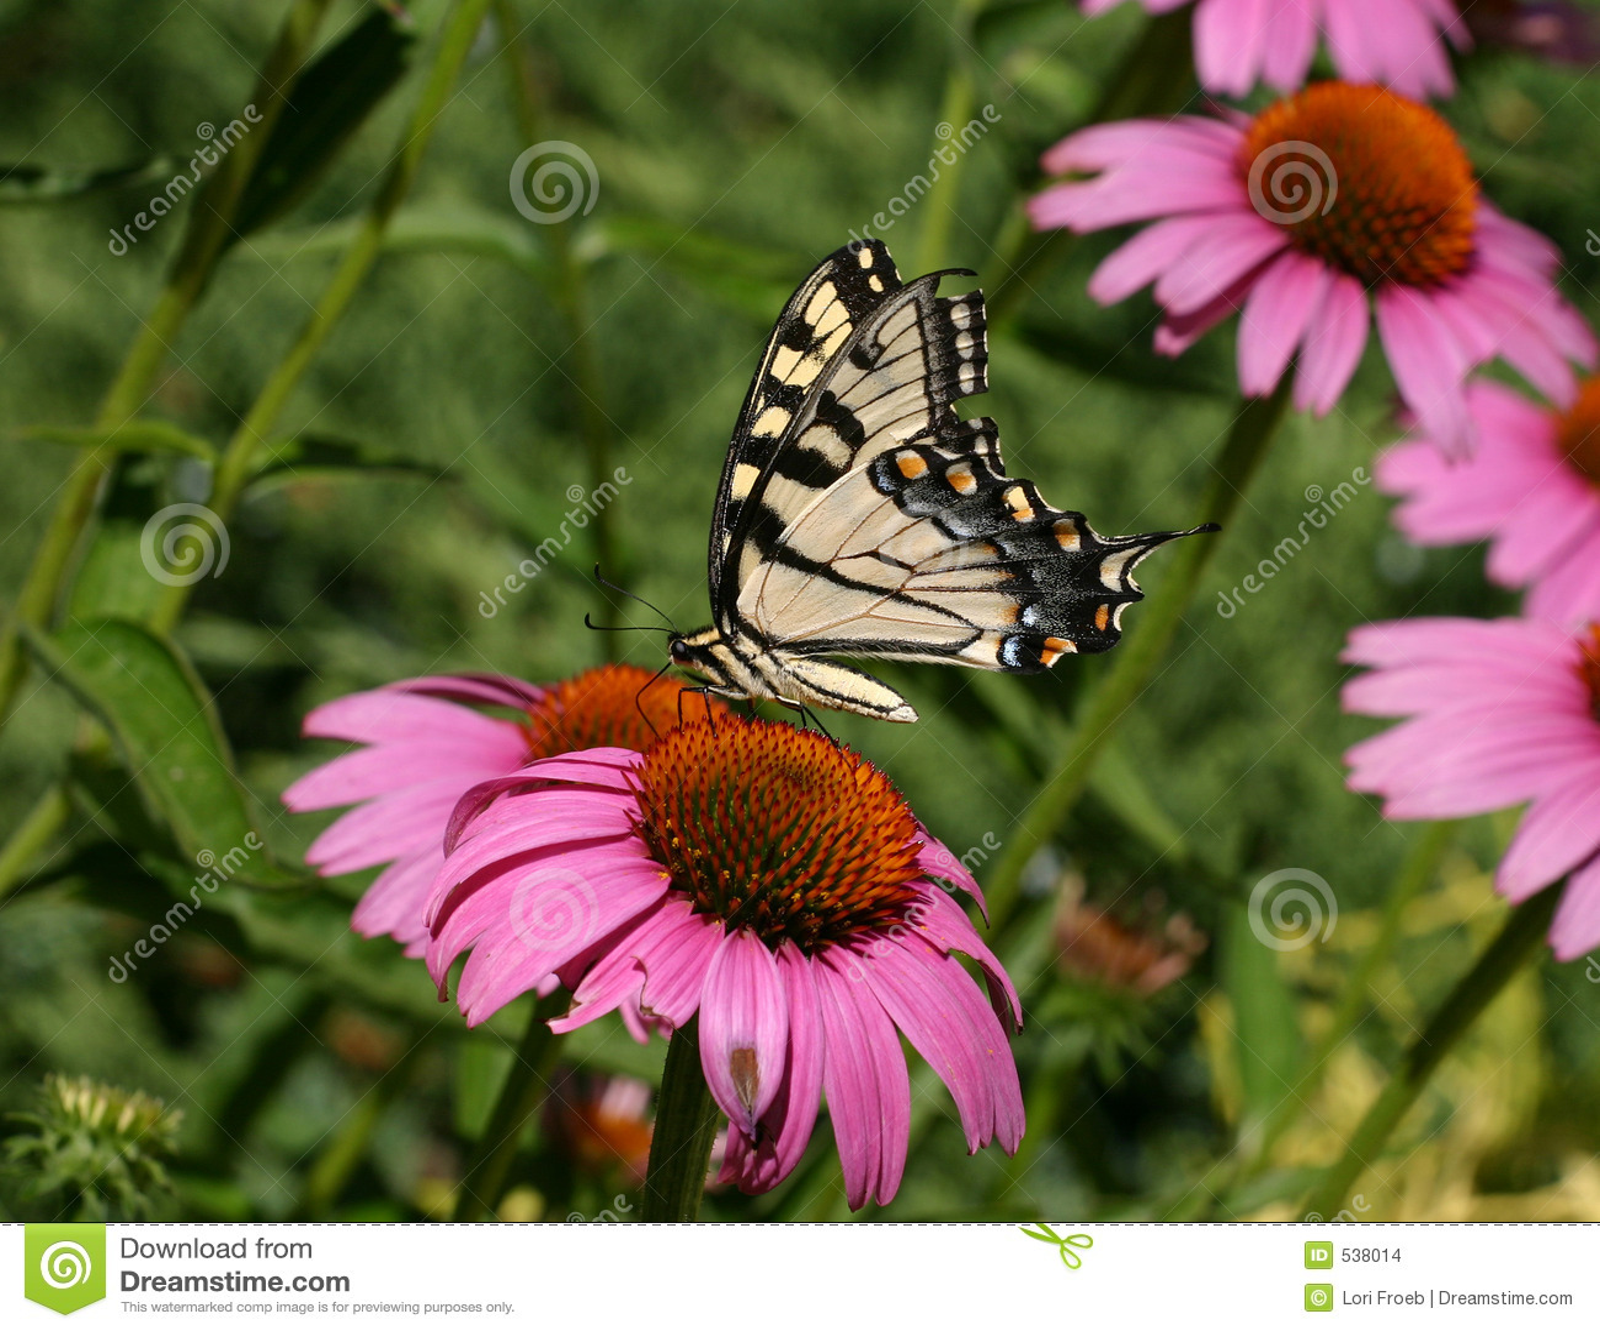 Download 锥体花swallowtail 库存照片. 图片 包括有 昆虫, 象鼻, 授粉, 雏菊, 花粉, coneflower - 538014